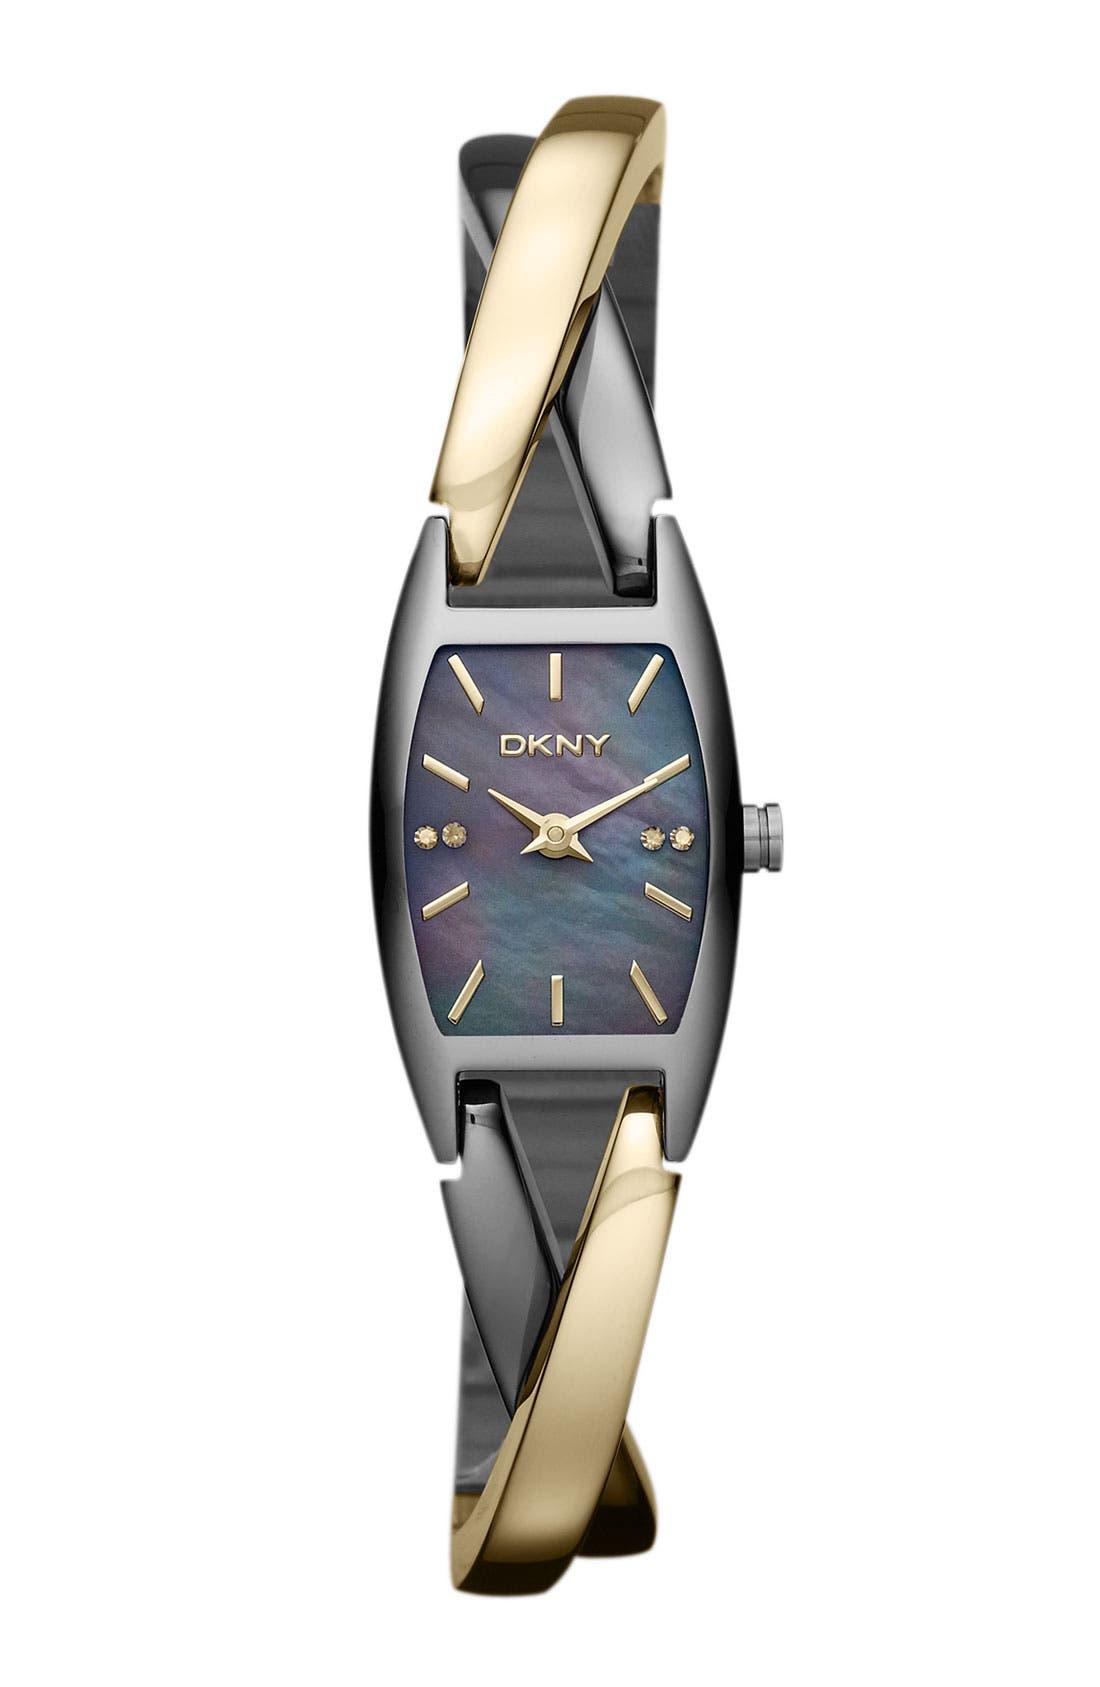 Main Image - DKNY 'Crosswalk' Bangle Watch, 18mm x 30mm